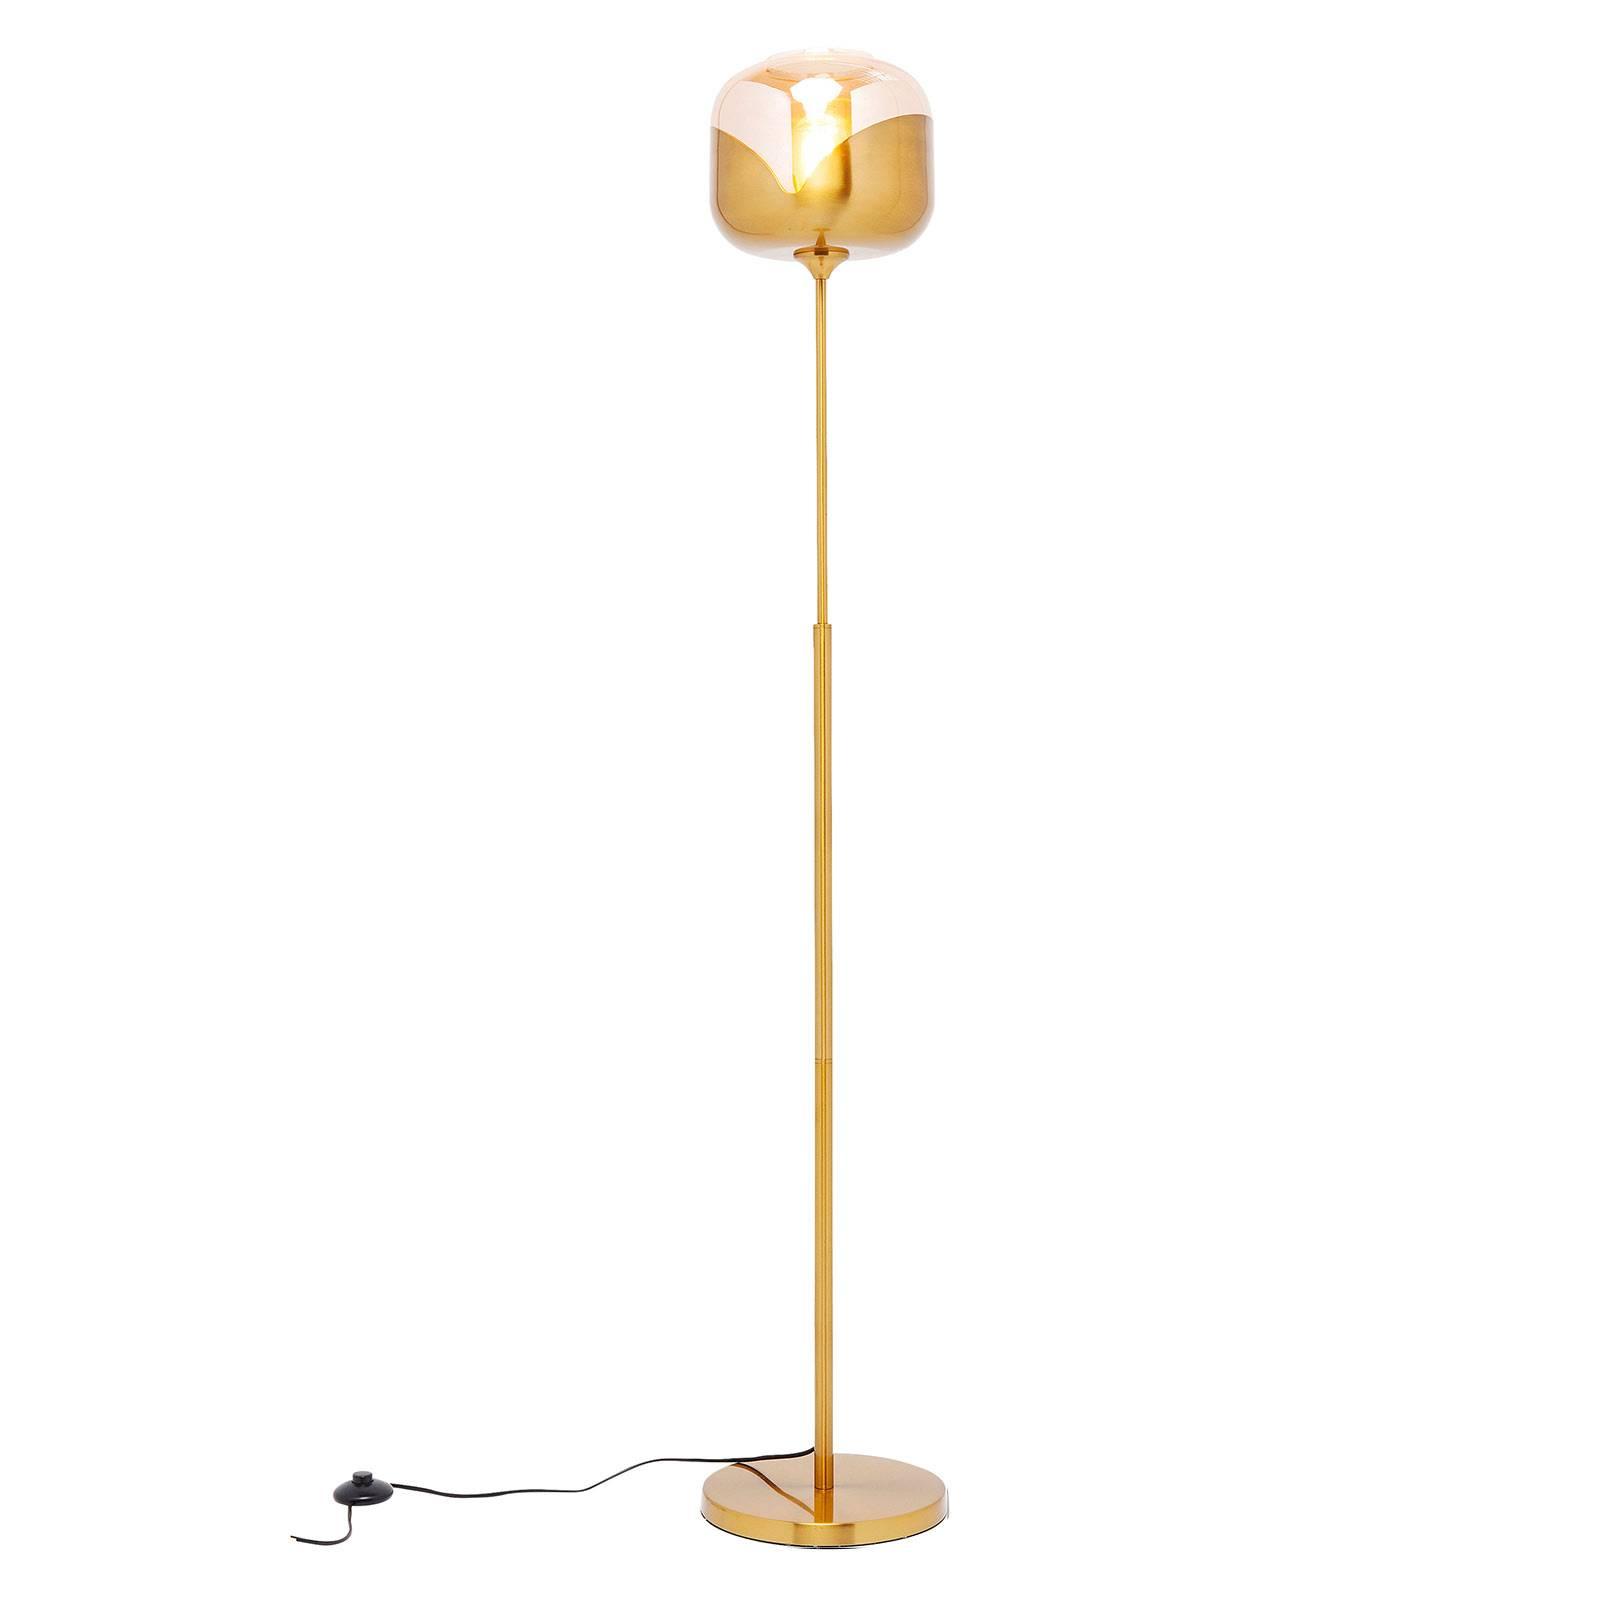 KARE Golden Goblet Ball Stehleuchte gold